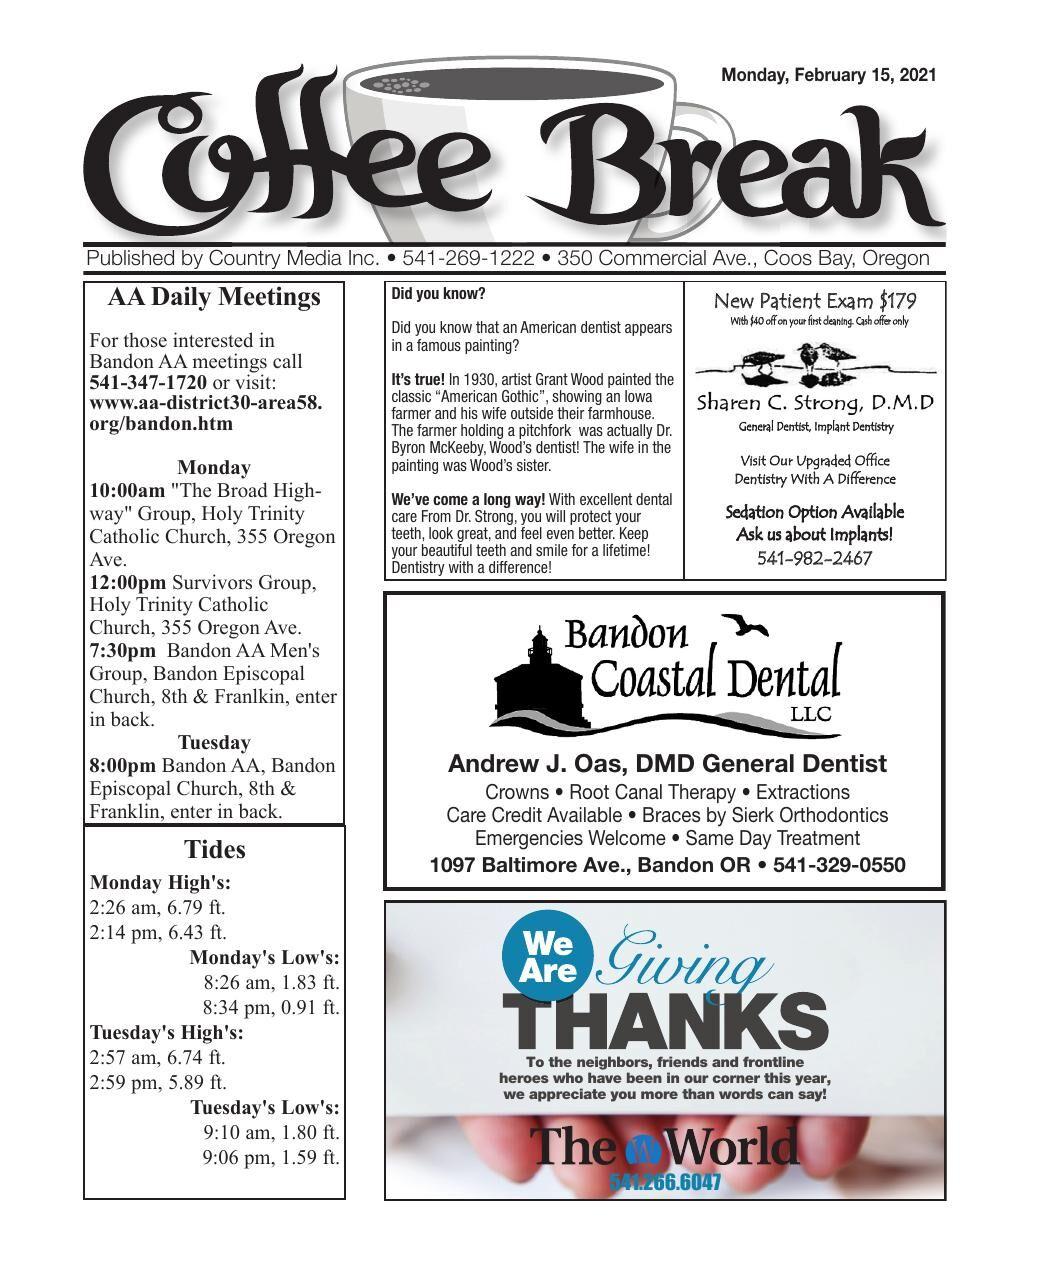 The Coffee Break 02-15-21